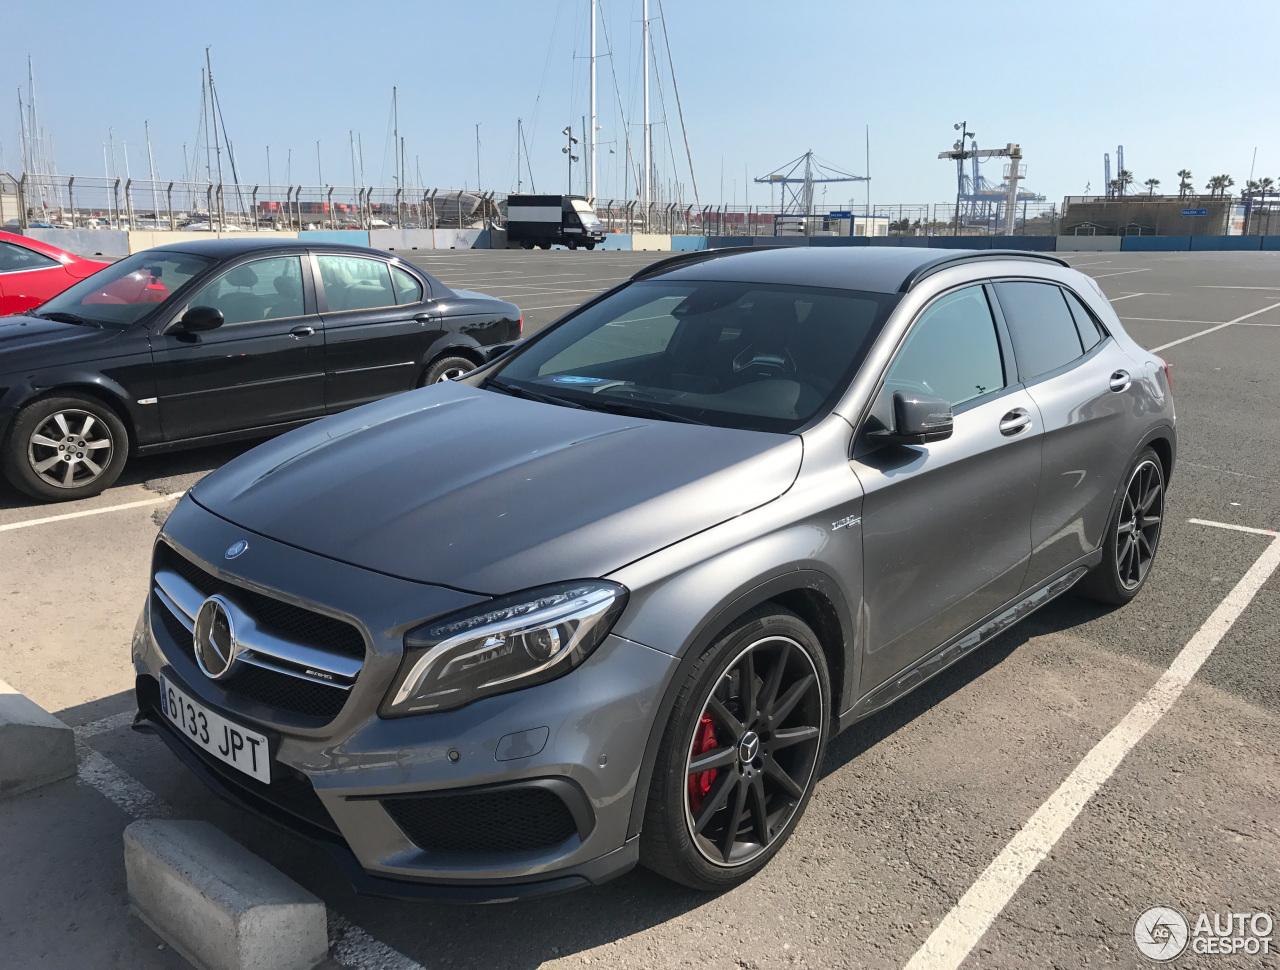 Mercedes benz gla 45 amg x156 16 marzo 2017 autogespot for 2017 amg gla 45 mercedes benz